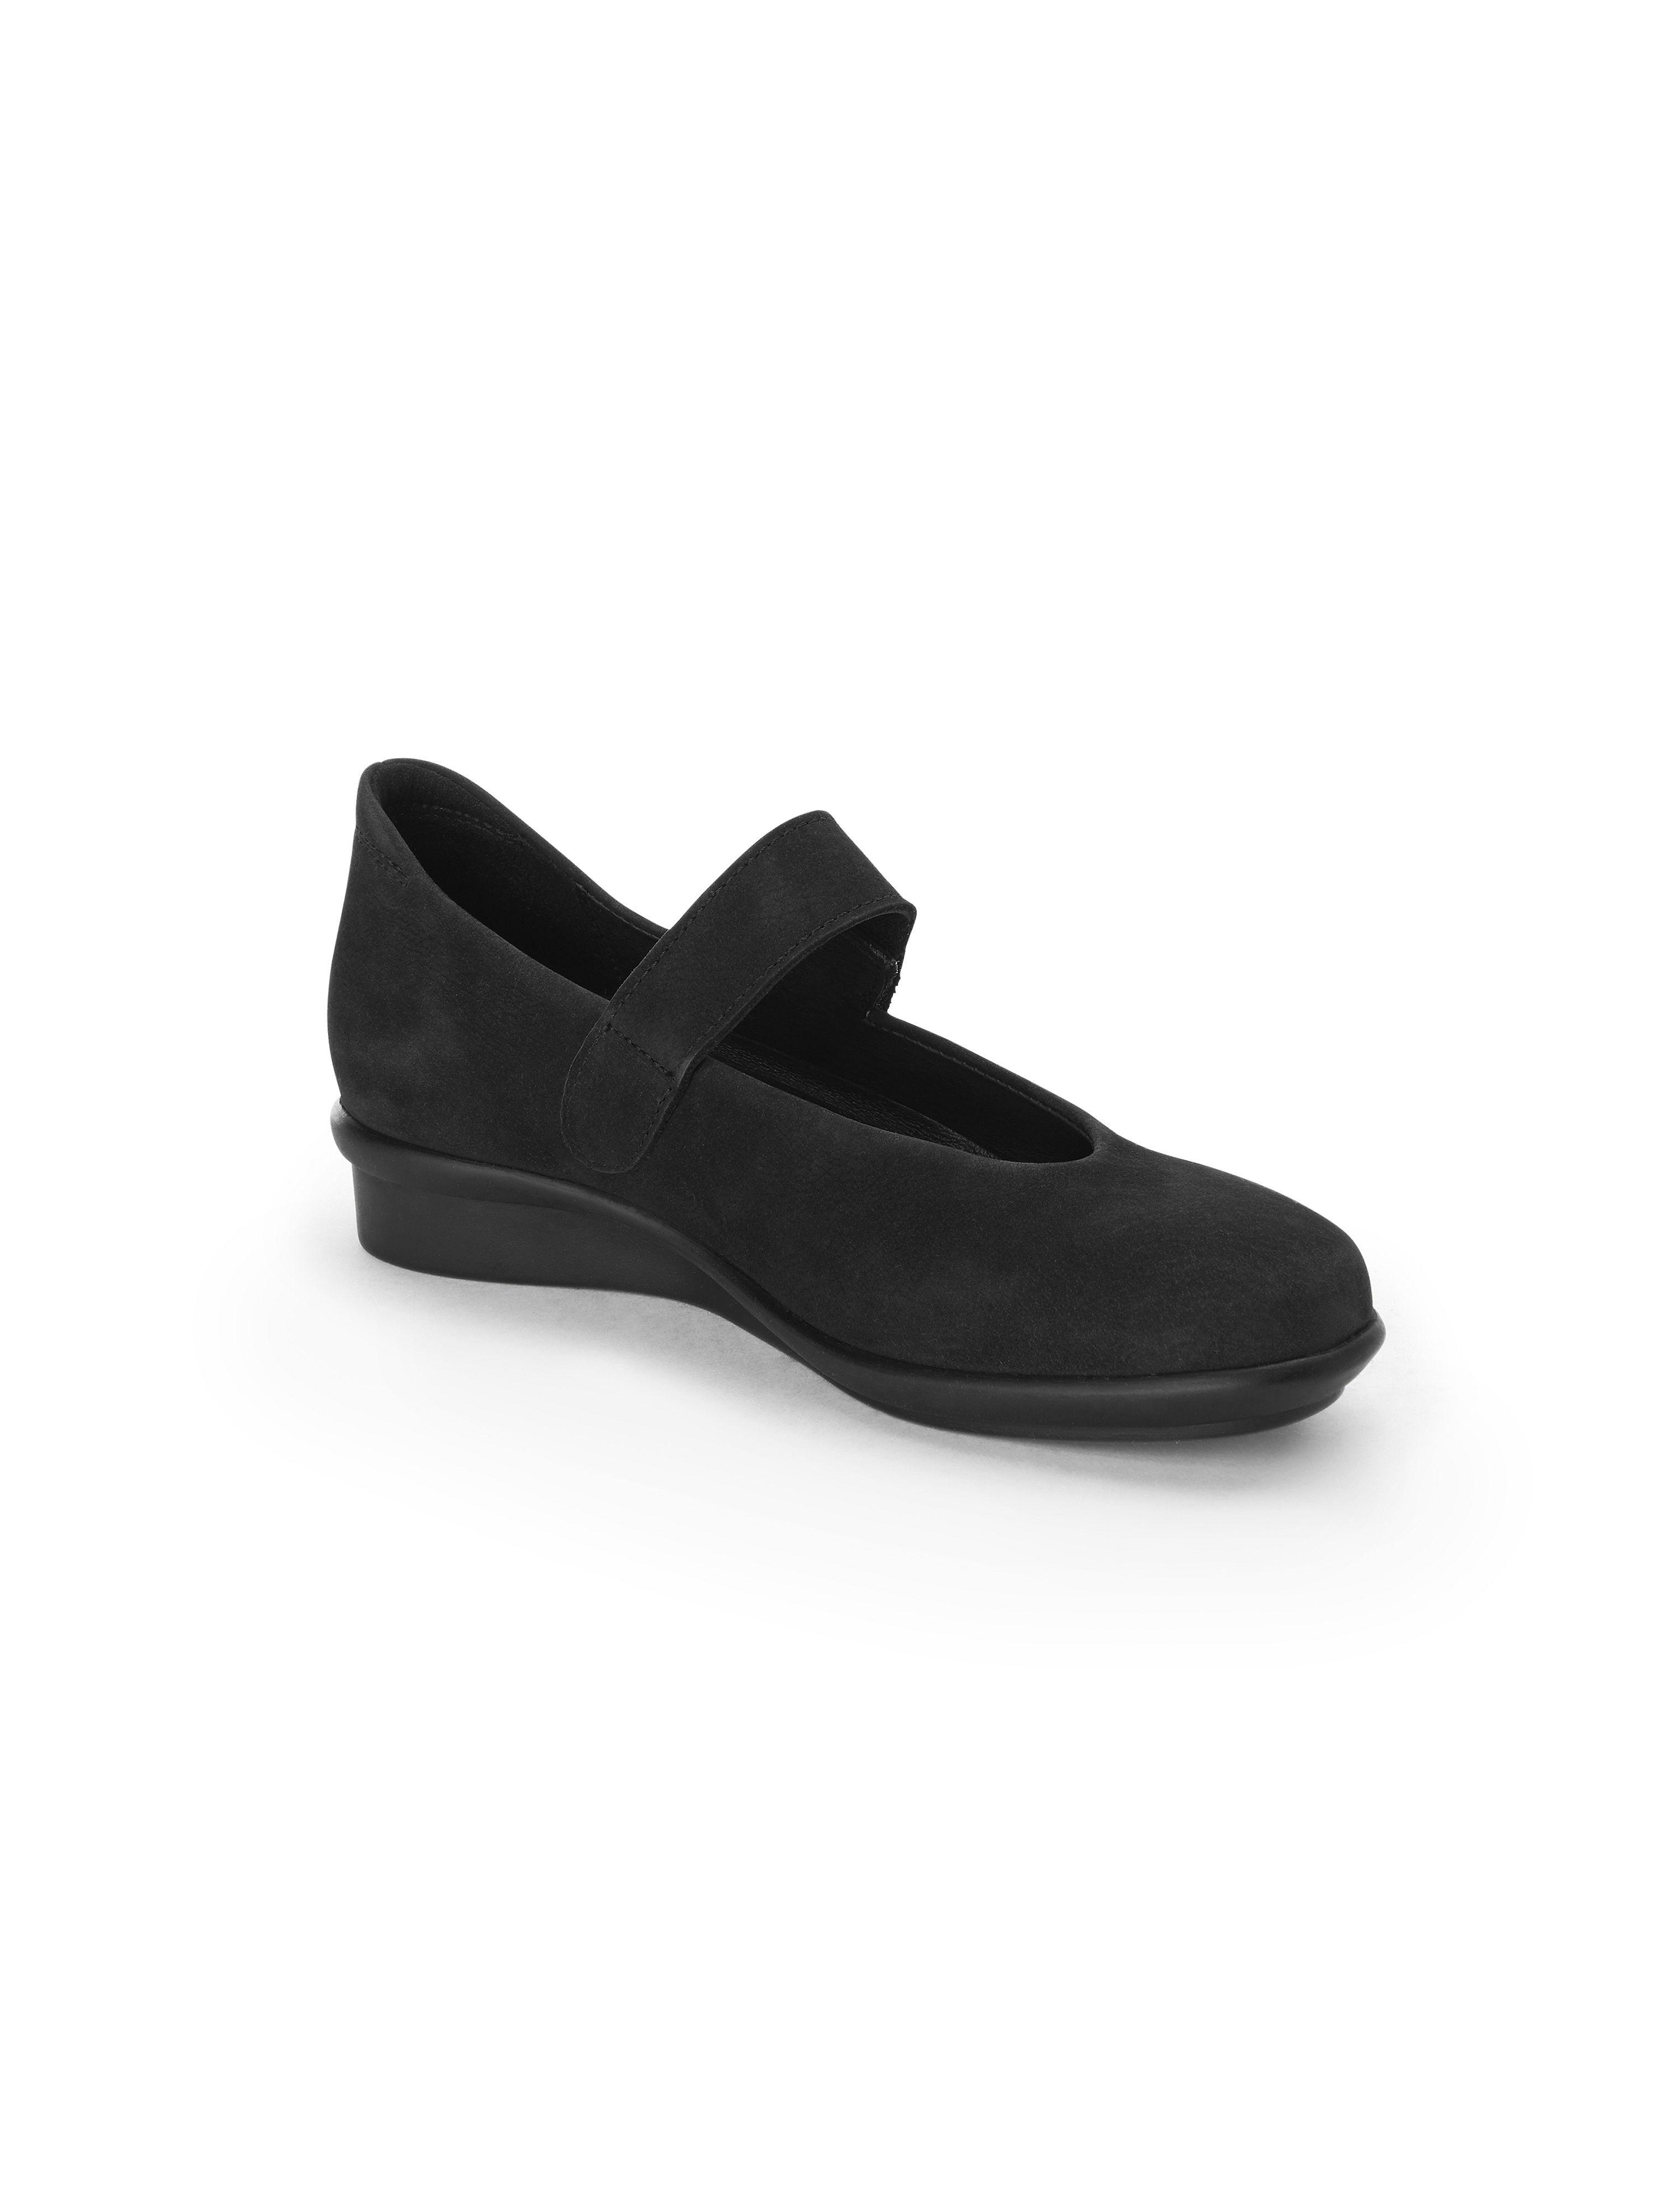 Loints Of Holland - Spangen-Ballerina - Schwarz Gute Qualität beliebte Schuhe